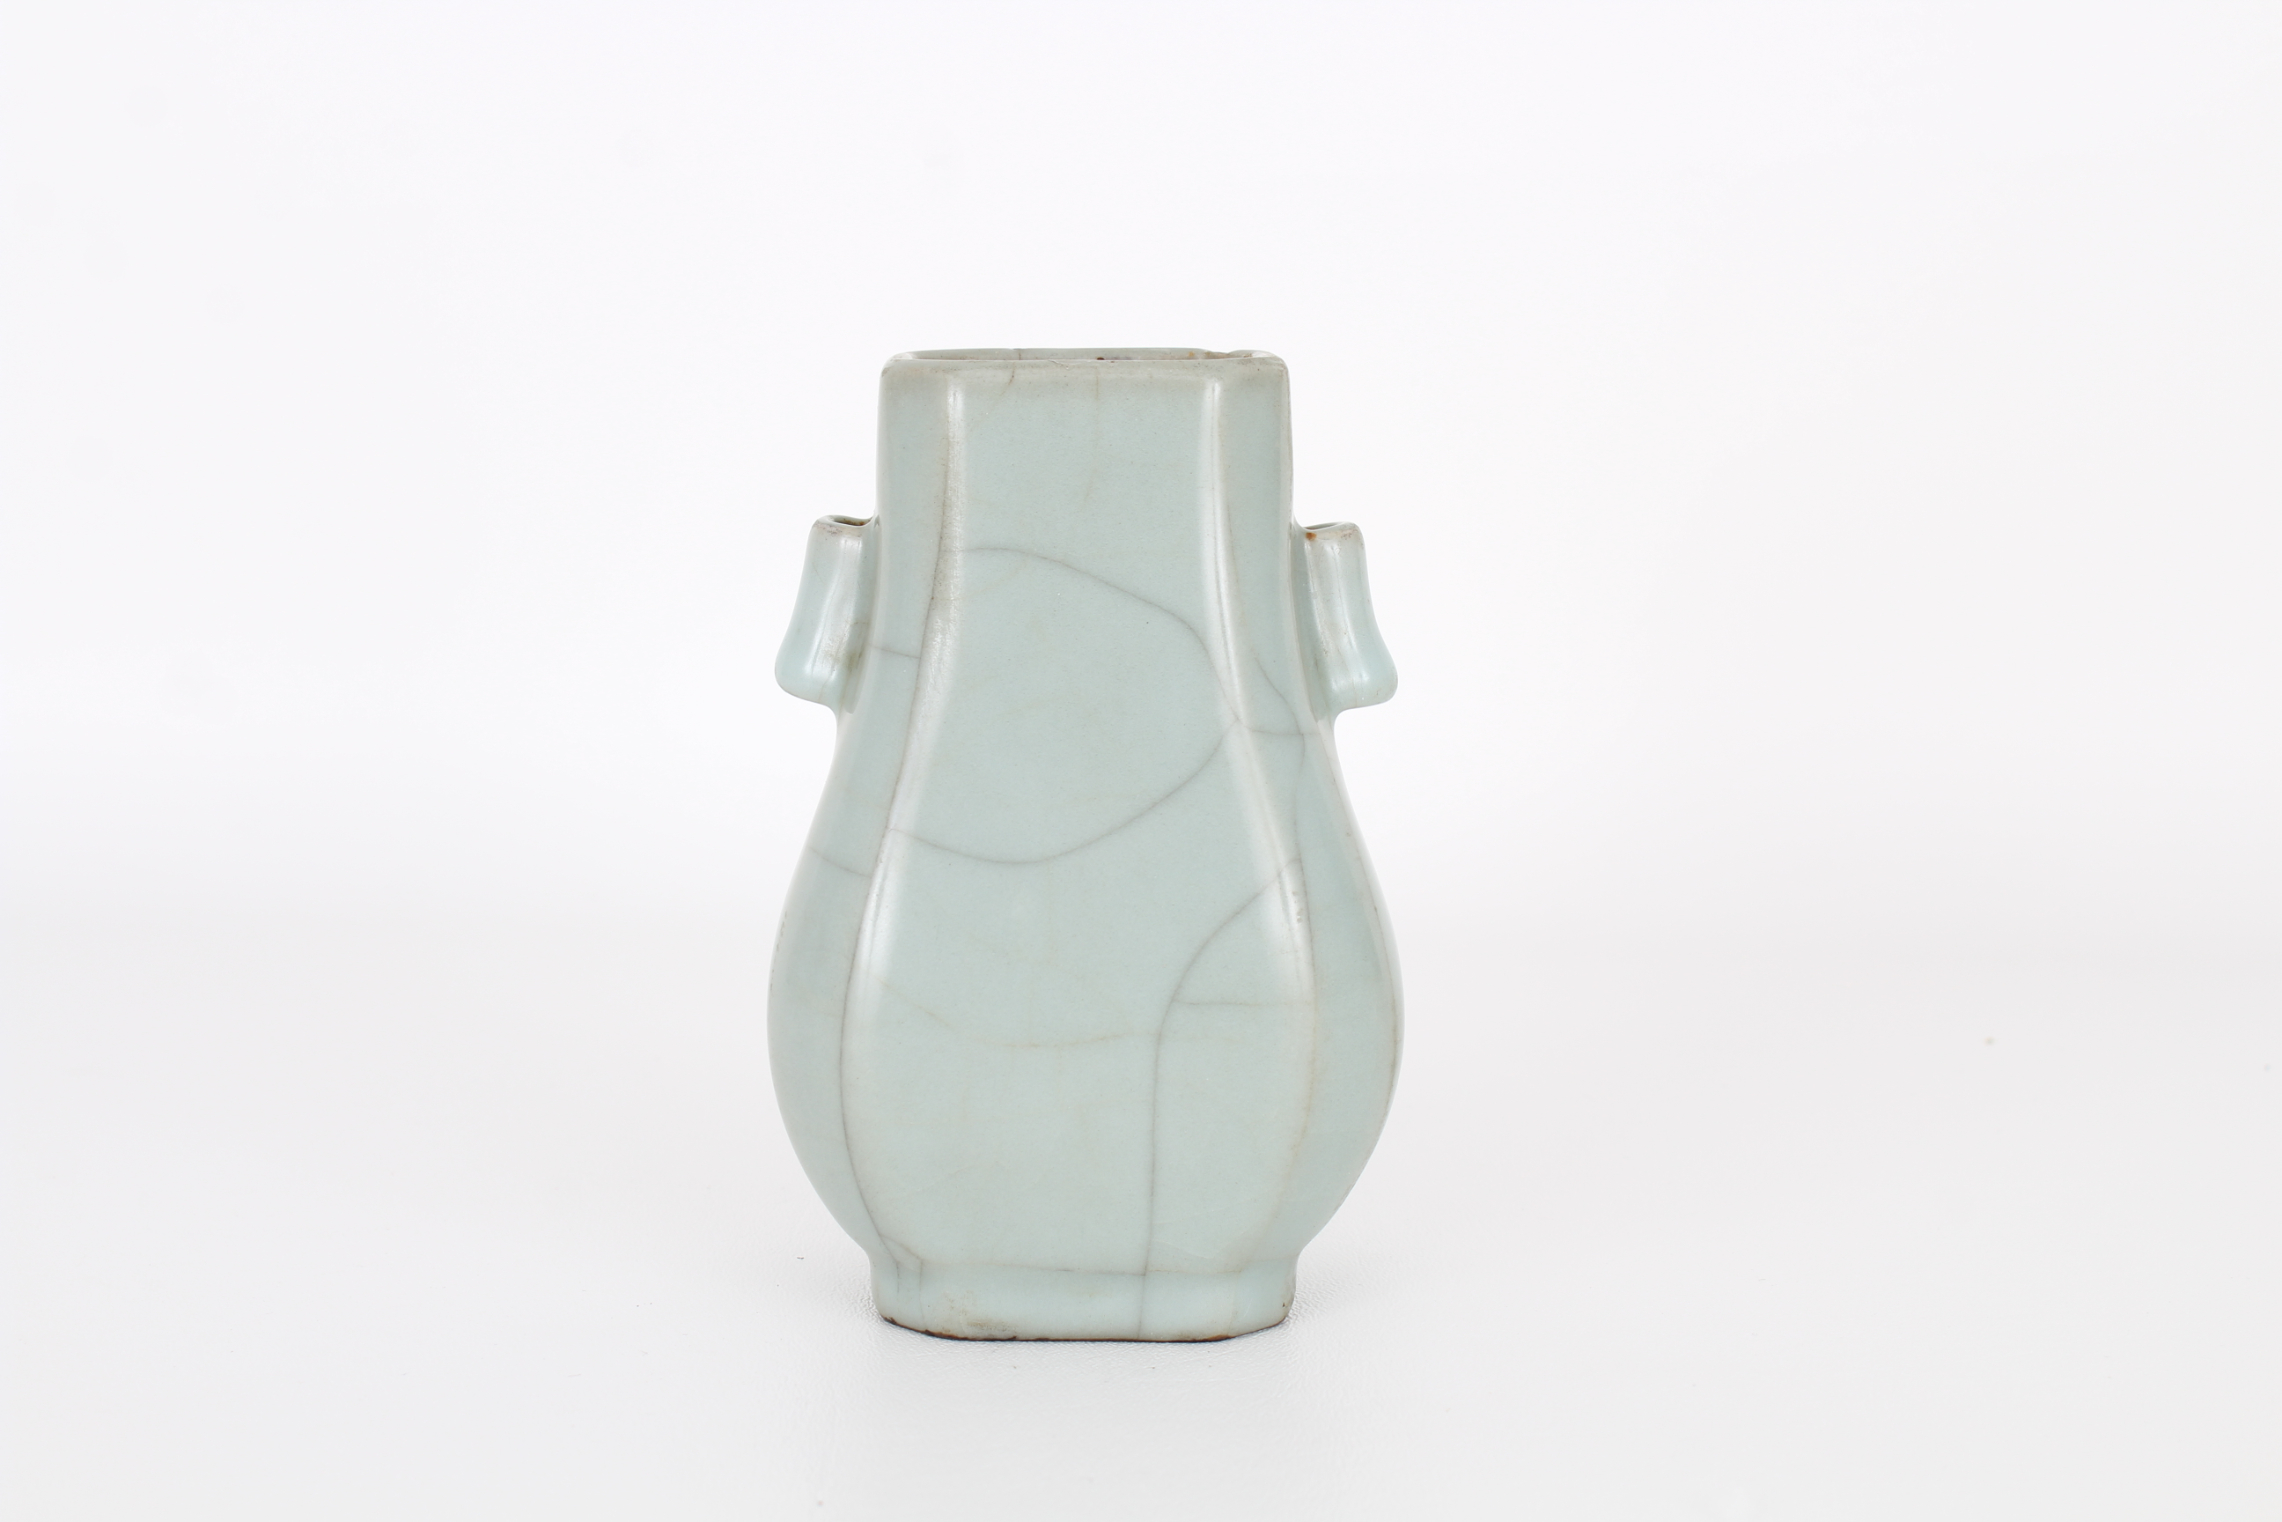 Chinese Guan-Type Vase, Qianlong Mark - Image 3 of 5